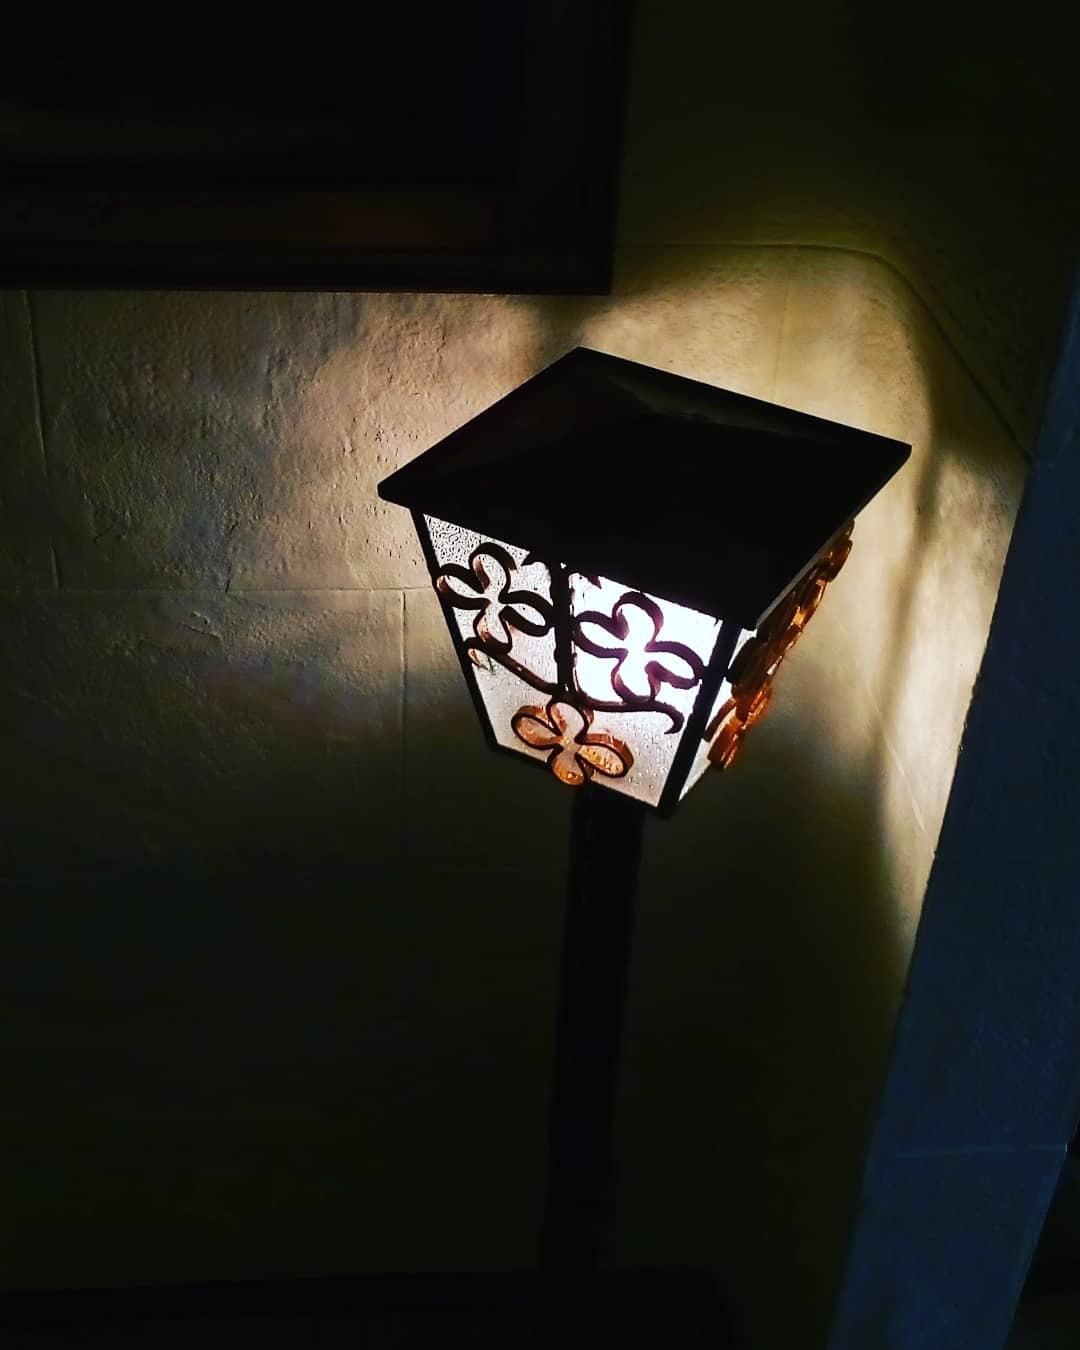 Light by _Saving_Time_